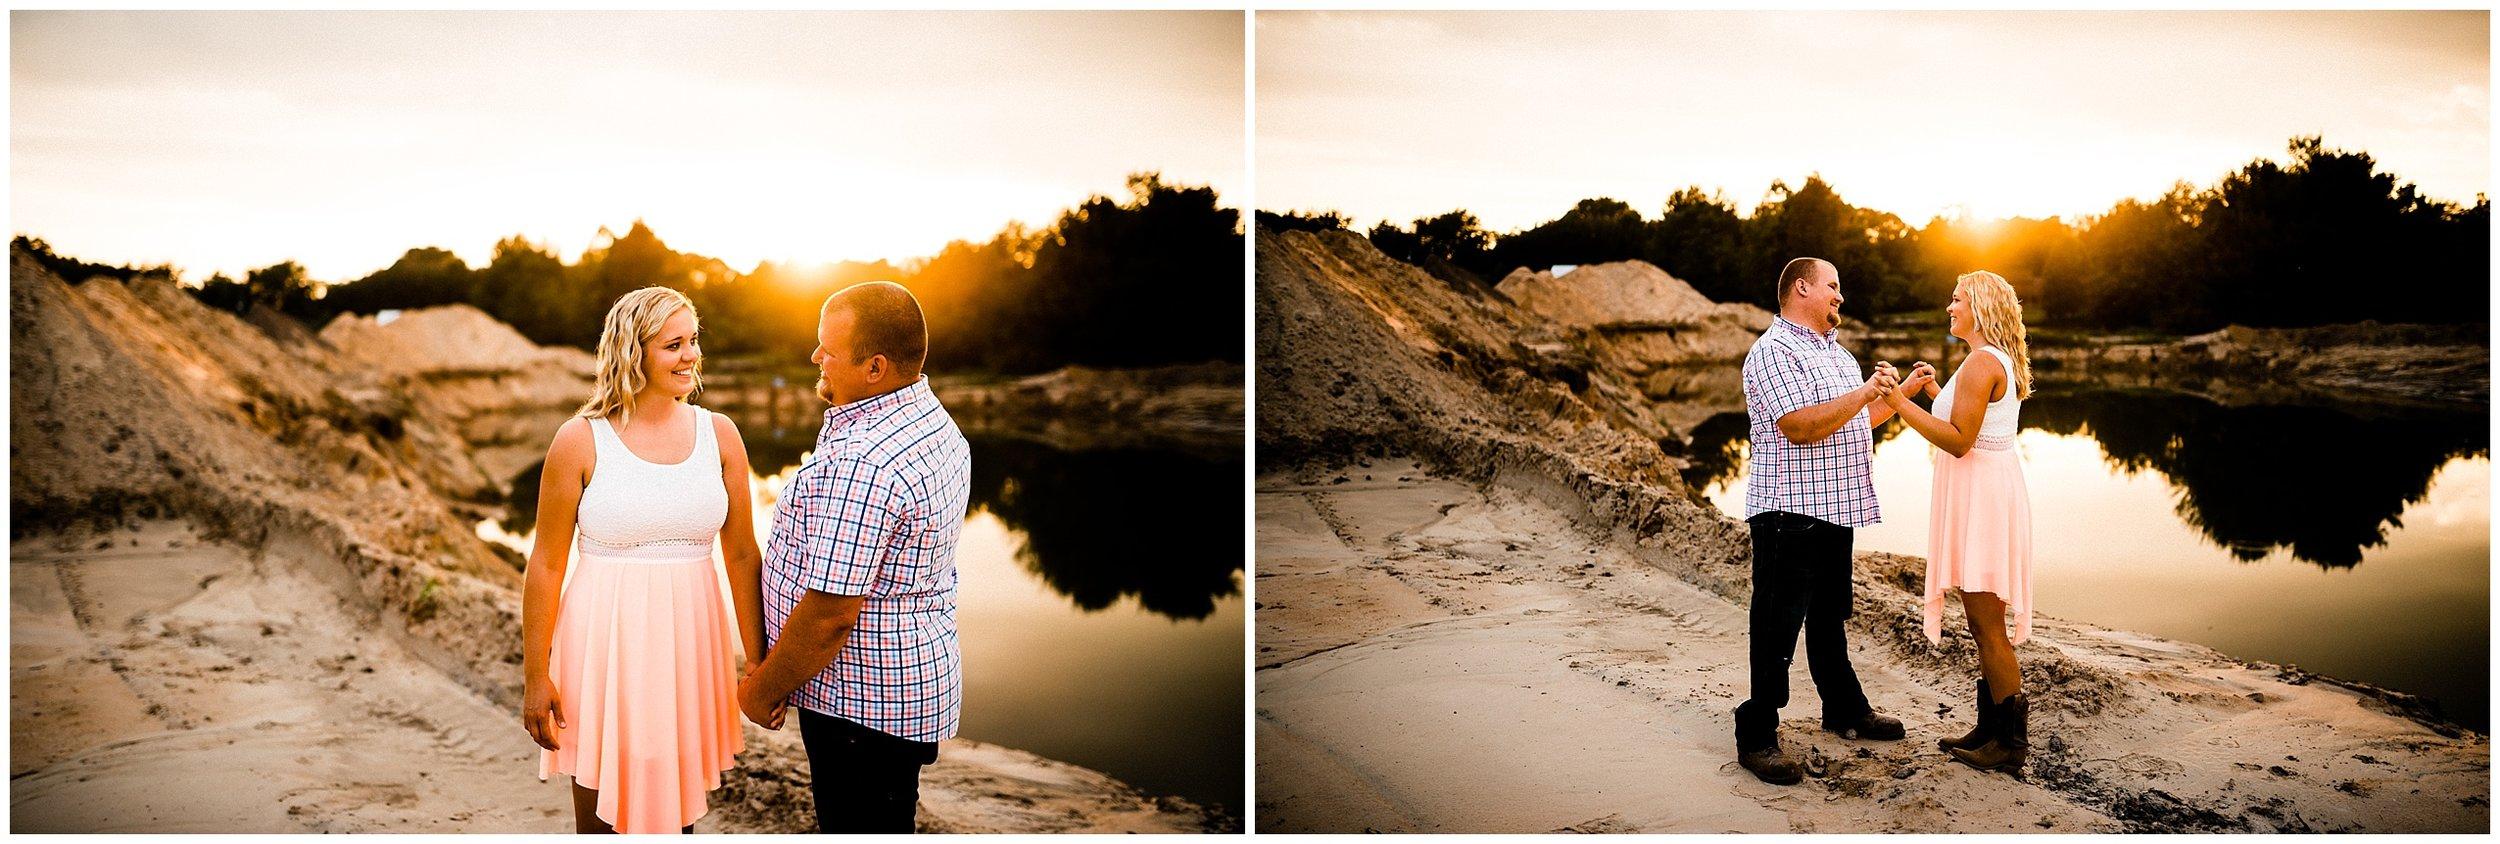 Nate + Tamryn | Engaged #kyleepaigephotography_1043.jpg